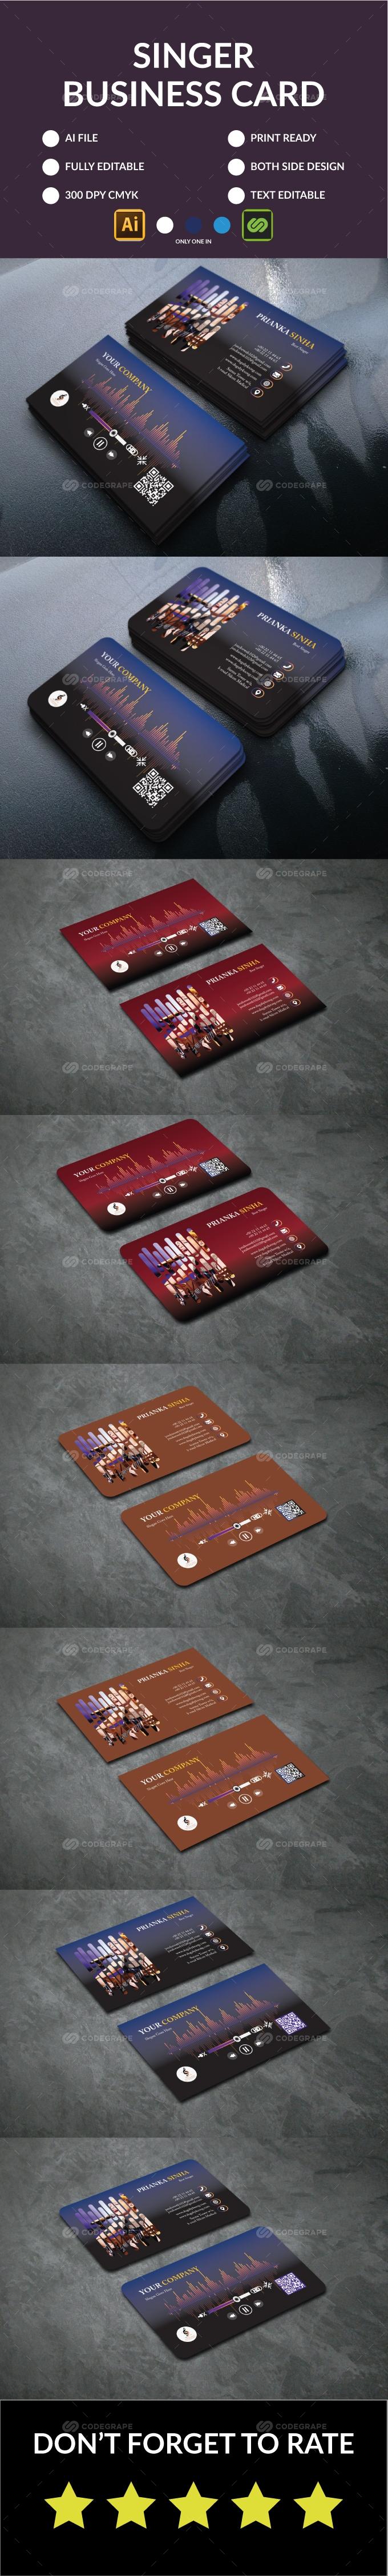 Singer Business Card